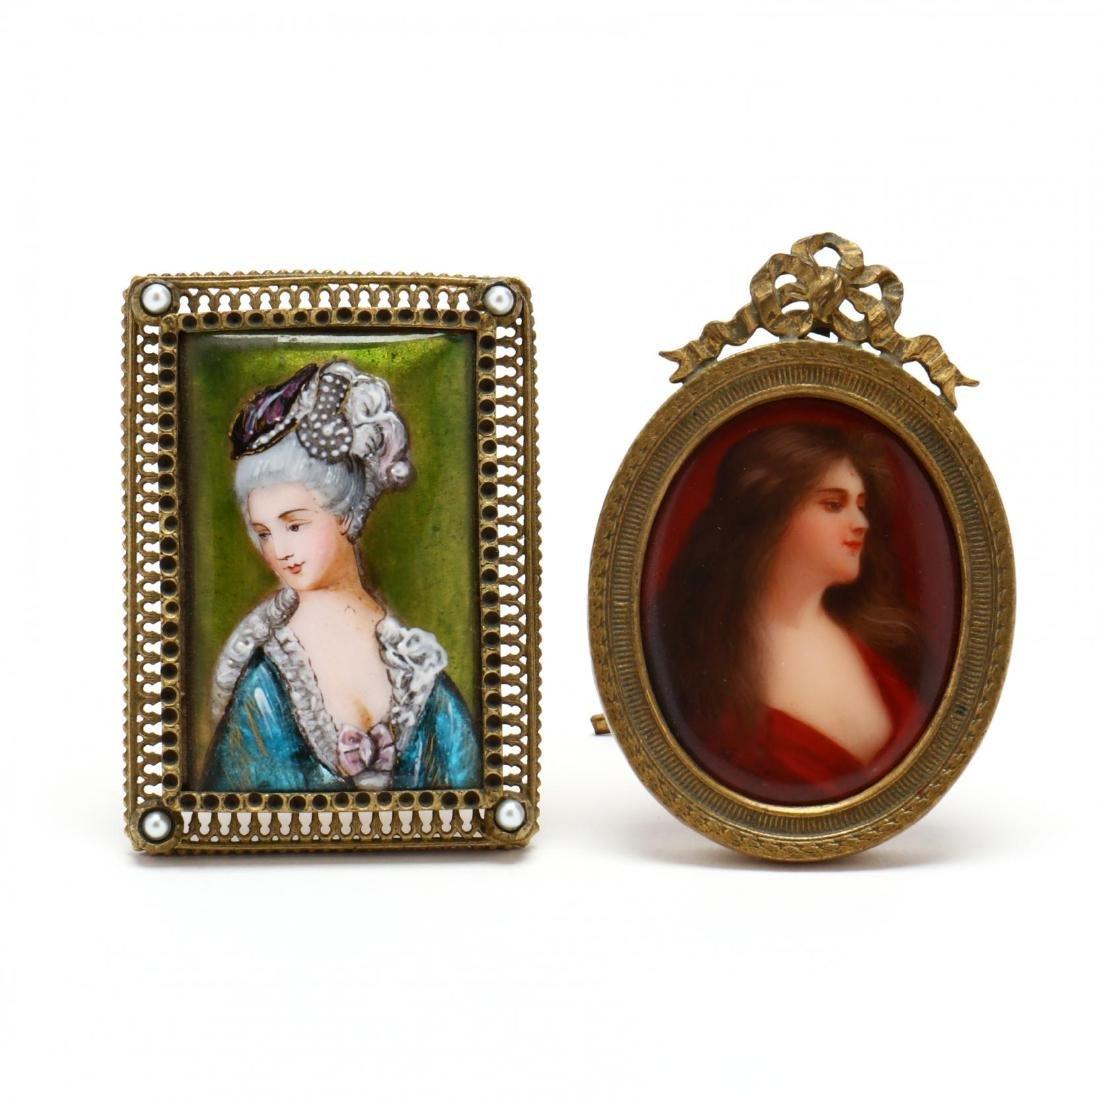 Two Miniature Portraits